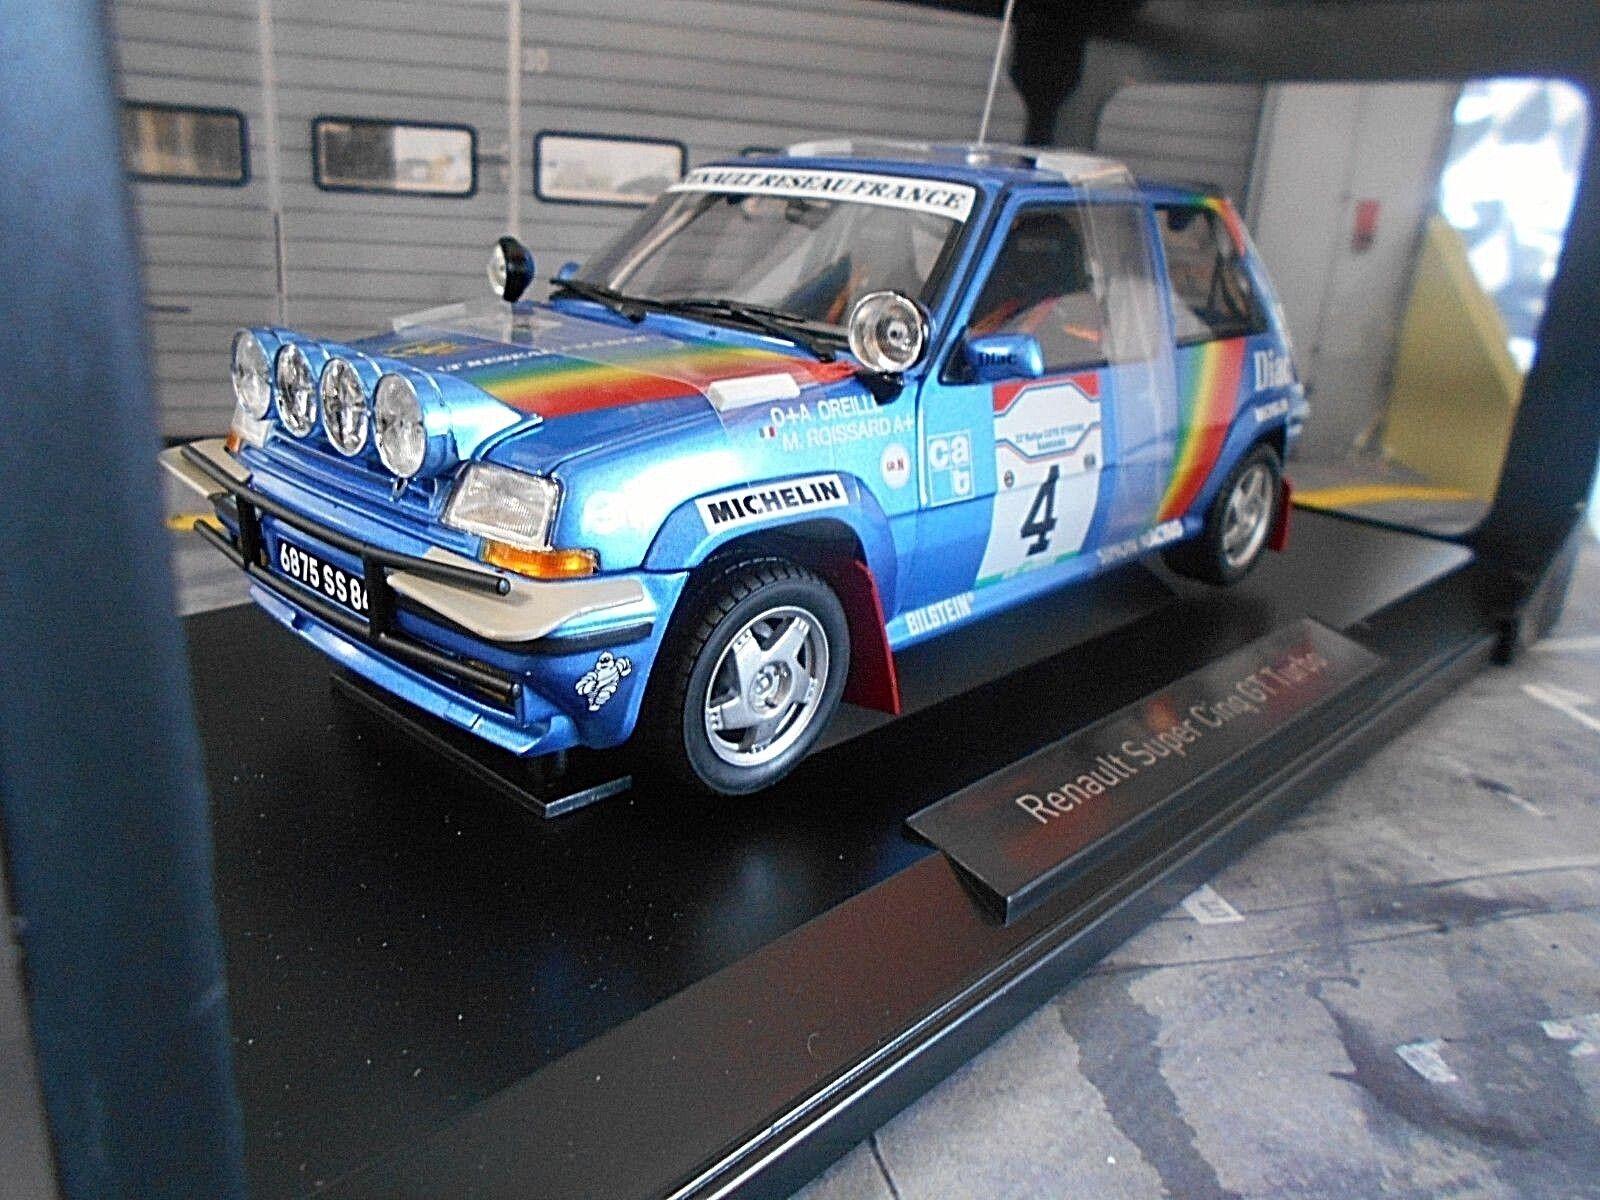 RENAULT 5 TURBO GT Rally Bandama AVORIO 1990  4 Oreille Diodo undici NOREV 1 18